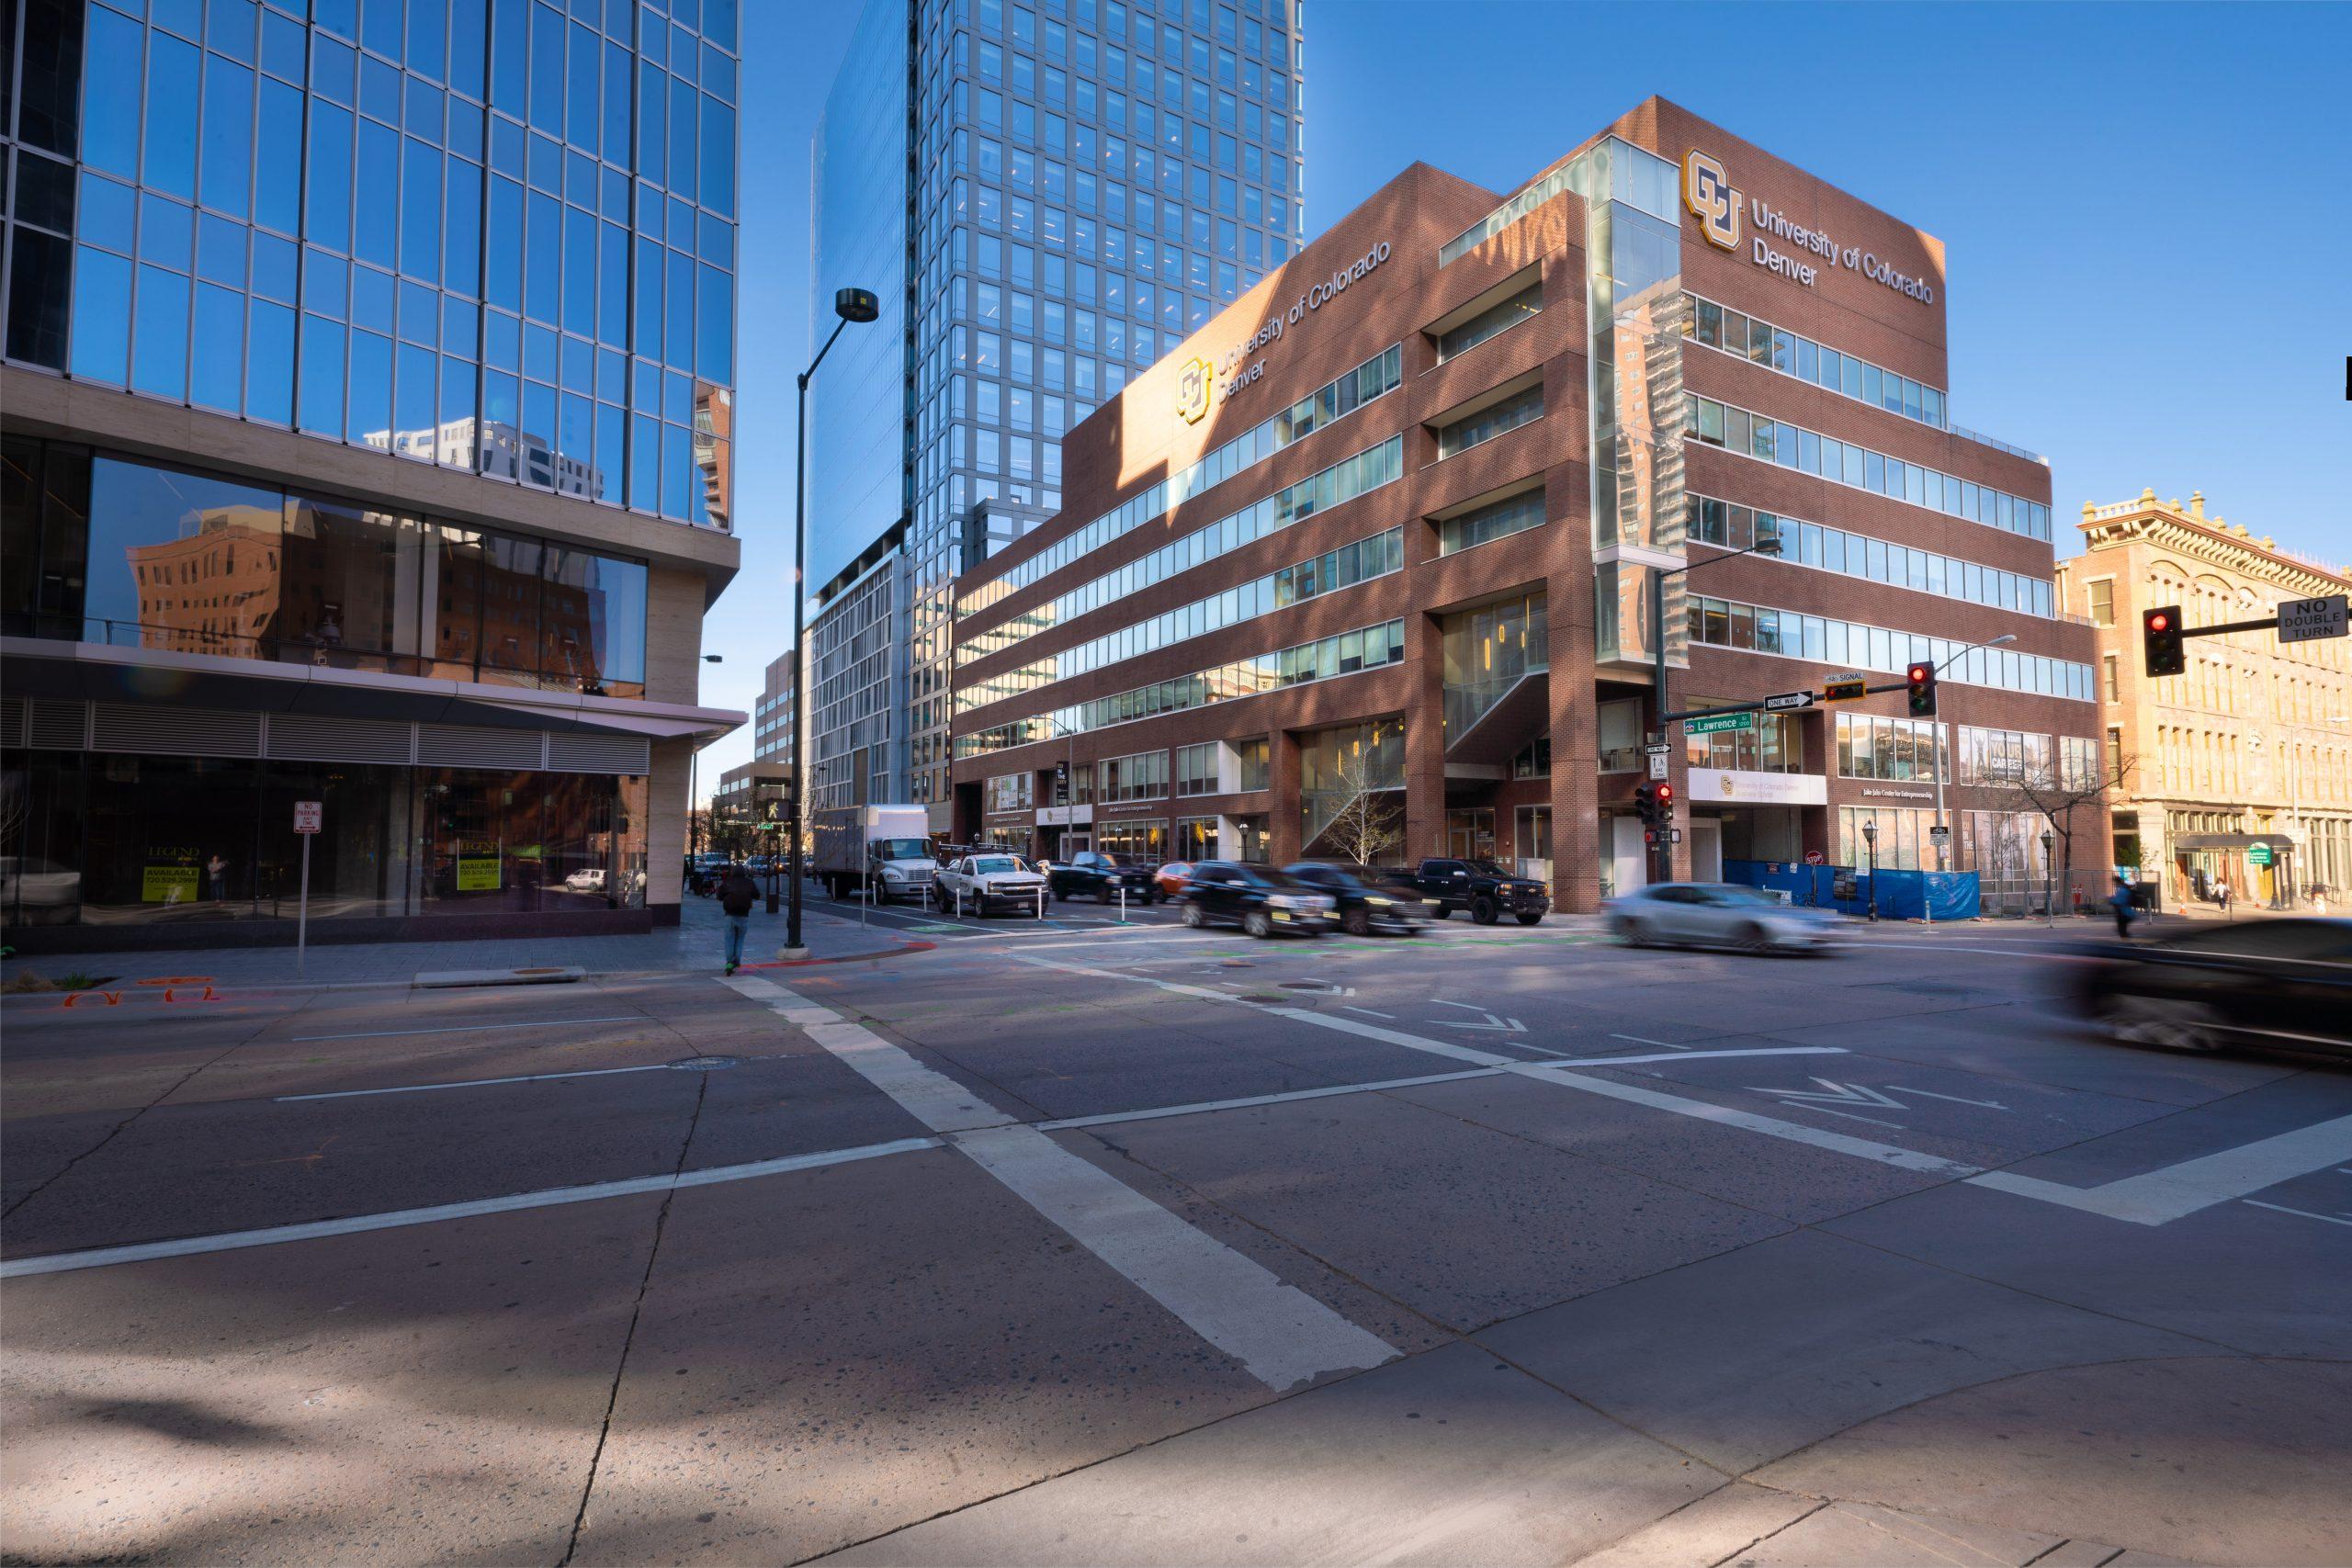 CU Denver Programs Rank Among Top 100 in the U.S. News 2022 Best Graduate  Schools - CU Denver News